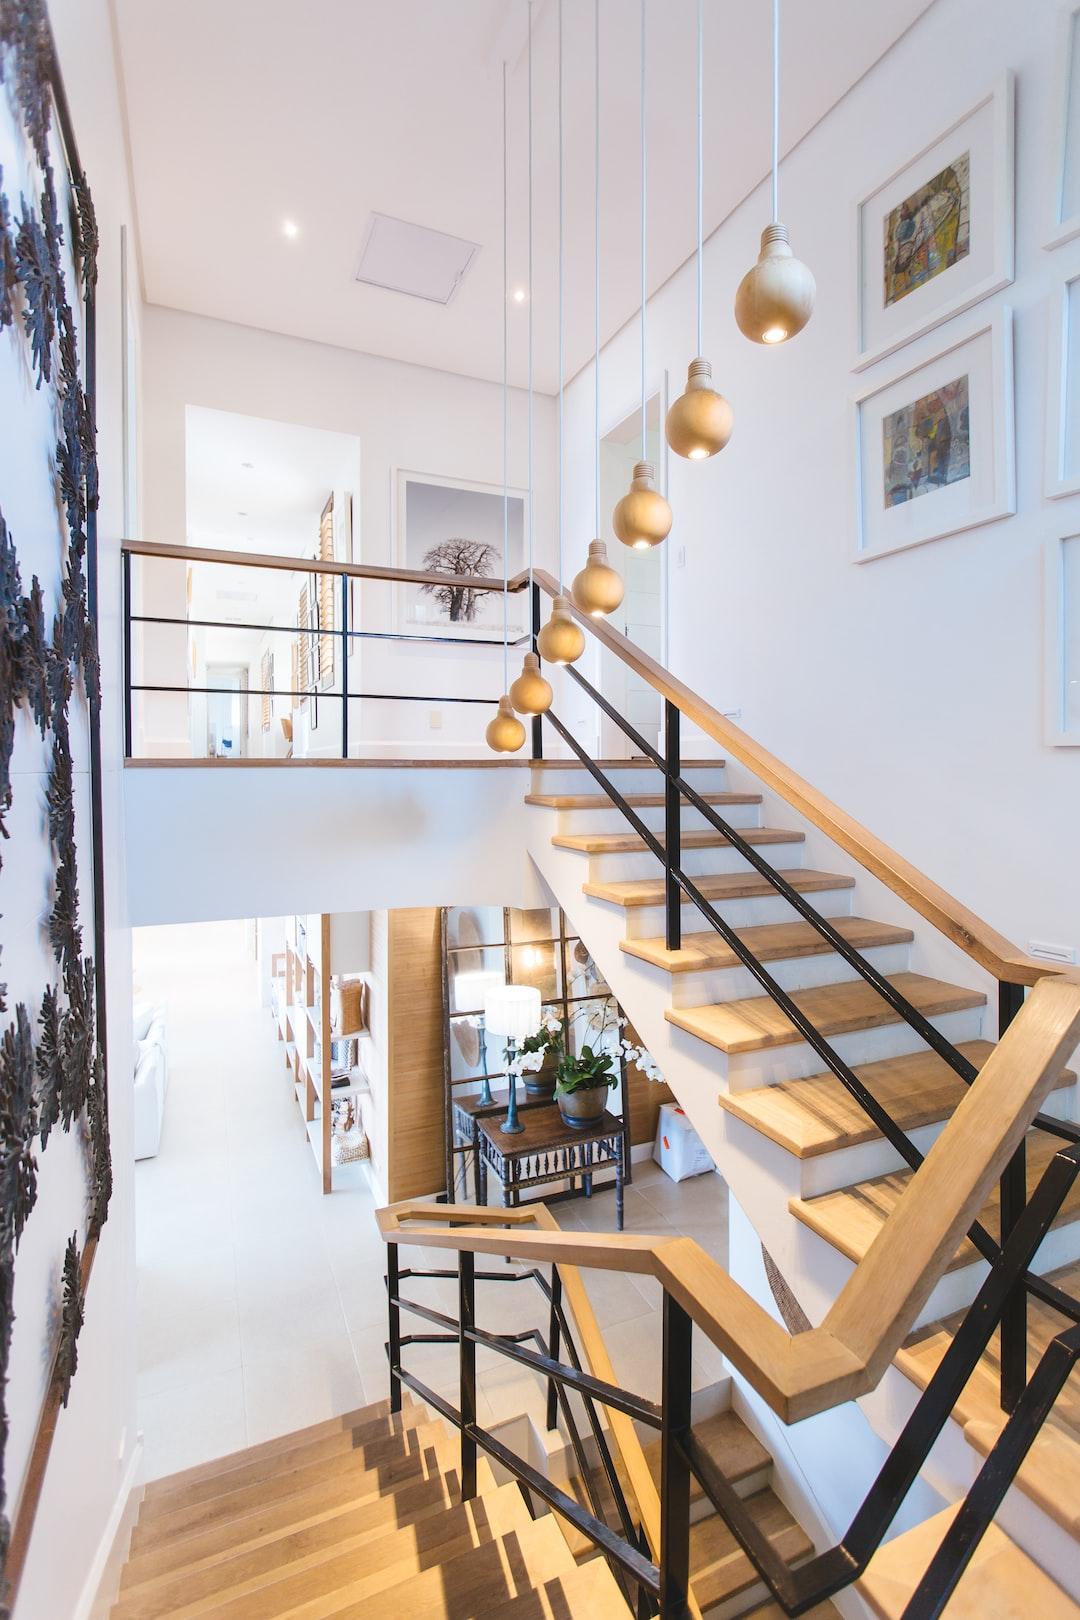 model house interior design pictures.  Interior Design Pictures Download Free Images on Unsplash